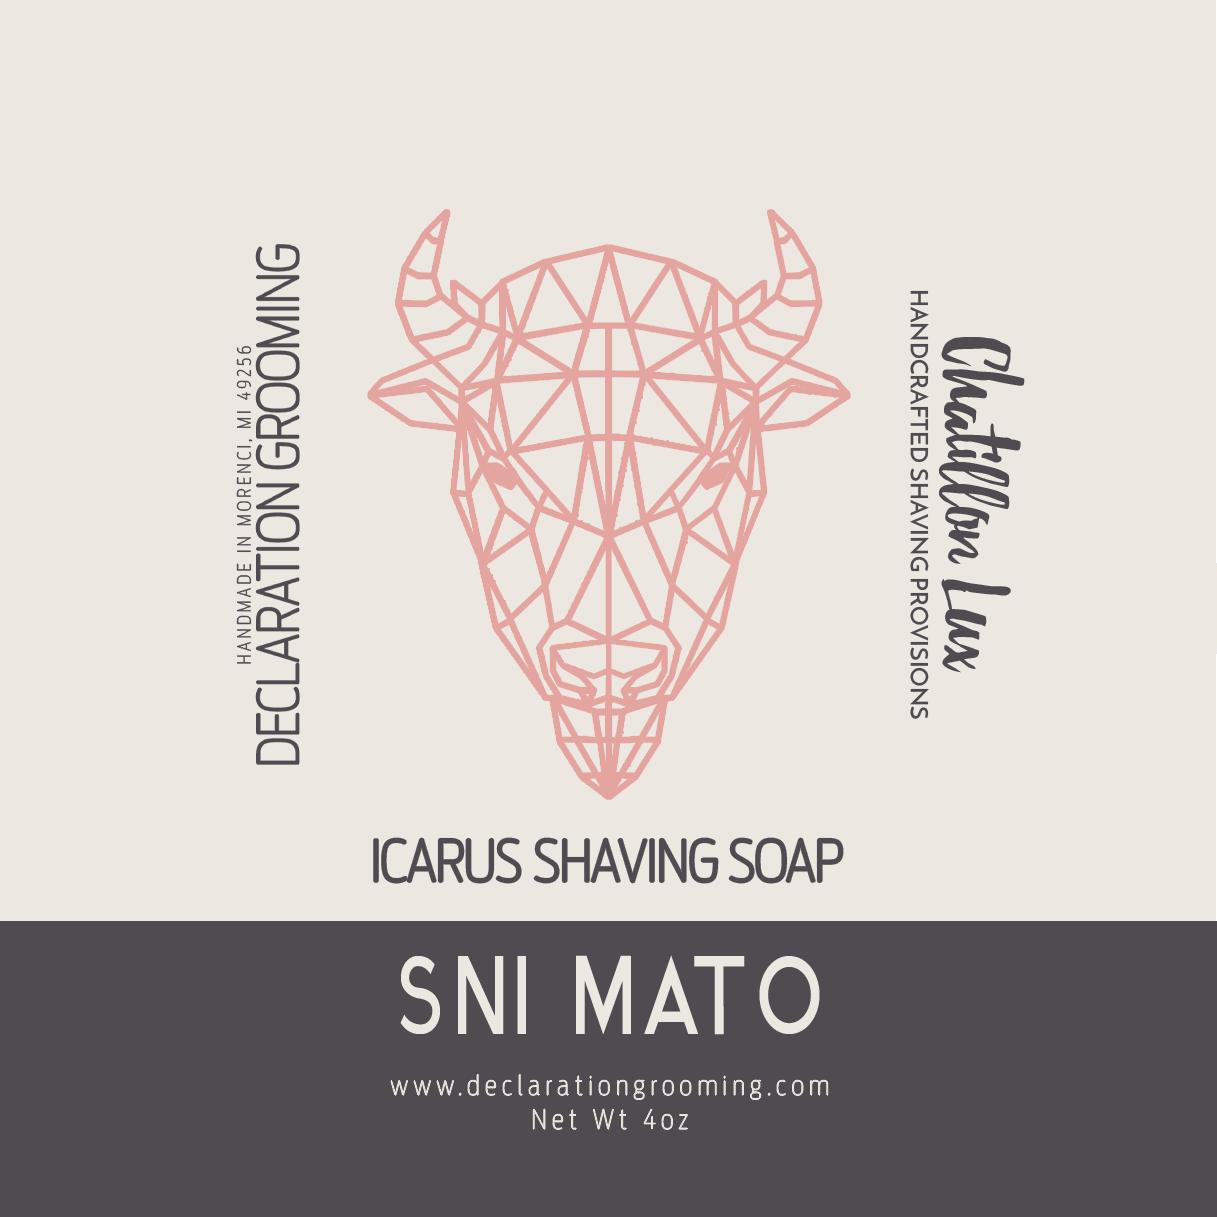 Chatillon Lux/Declaration Grooming - Sni Mato - Soap image